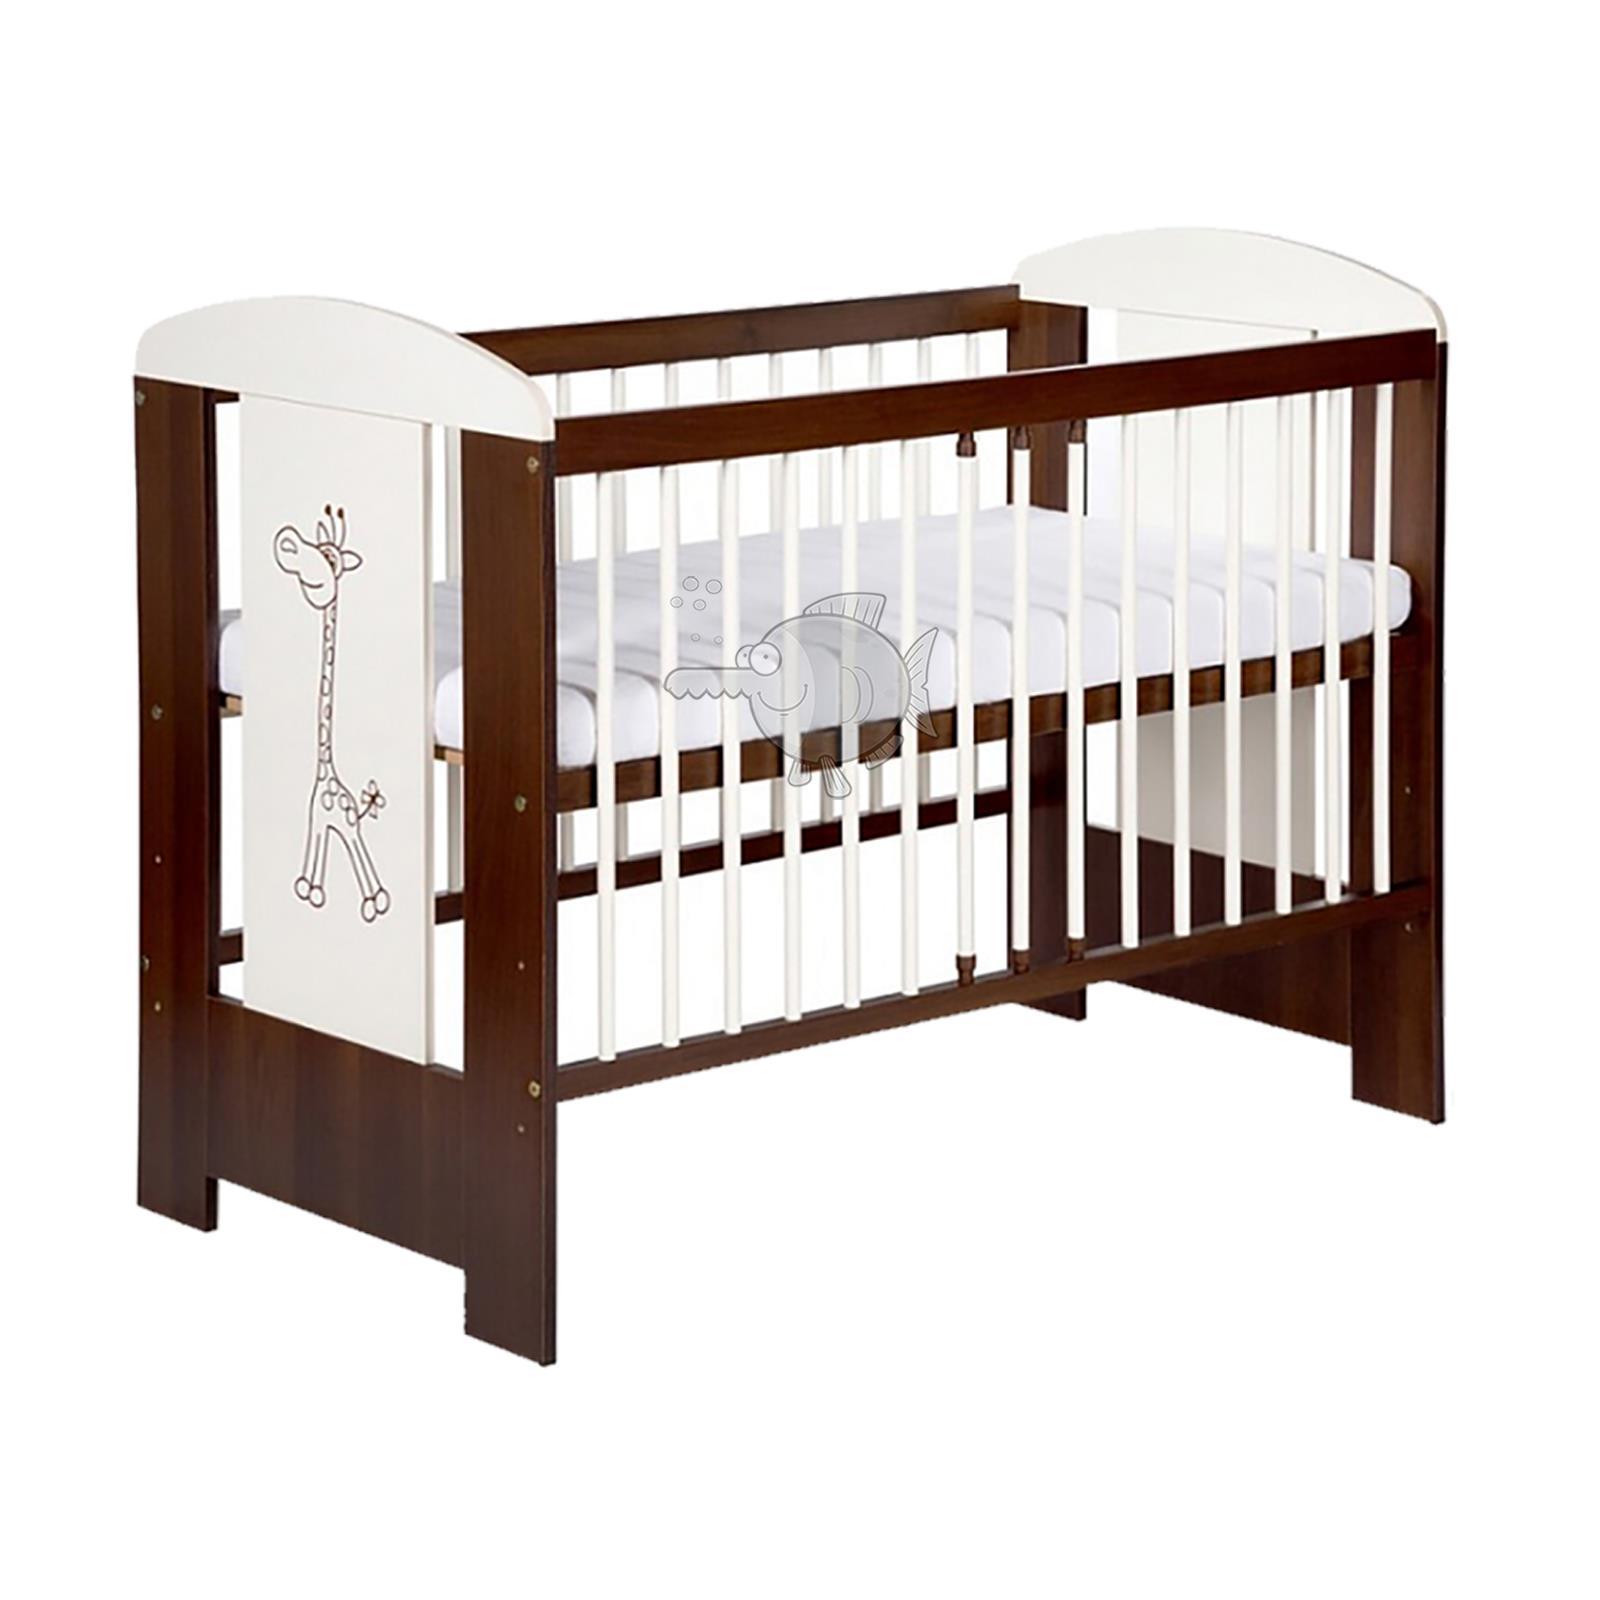 Wooden Baby Cot Bed Newborn Giraffe Crib Buckwheat Coconut Foam Mattress Drawer